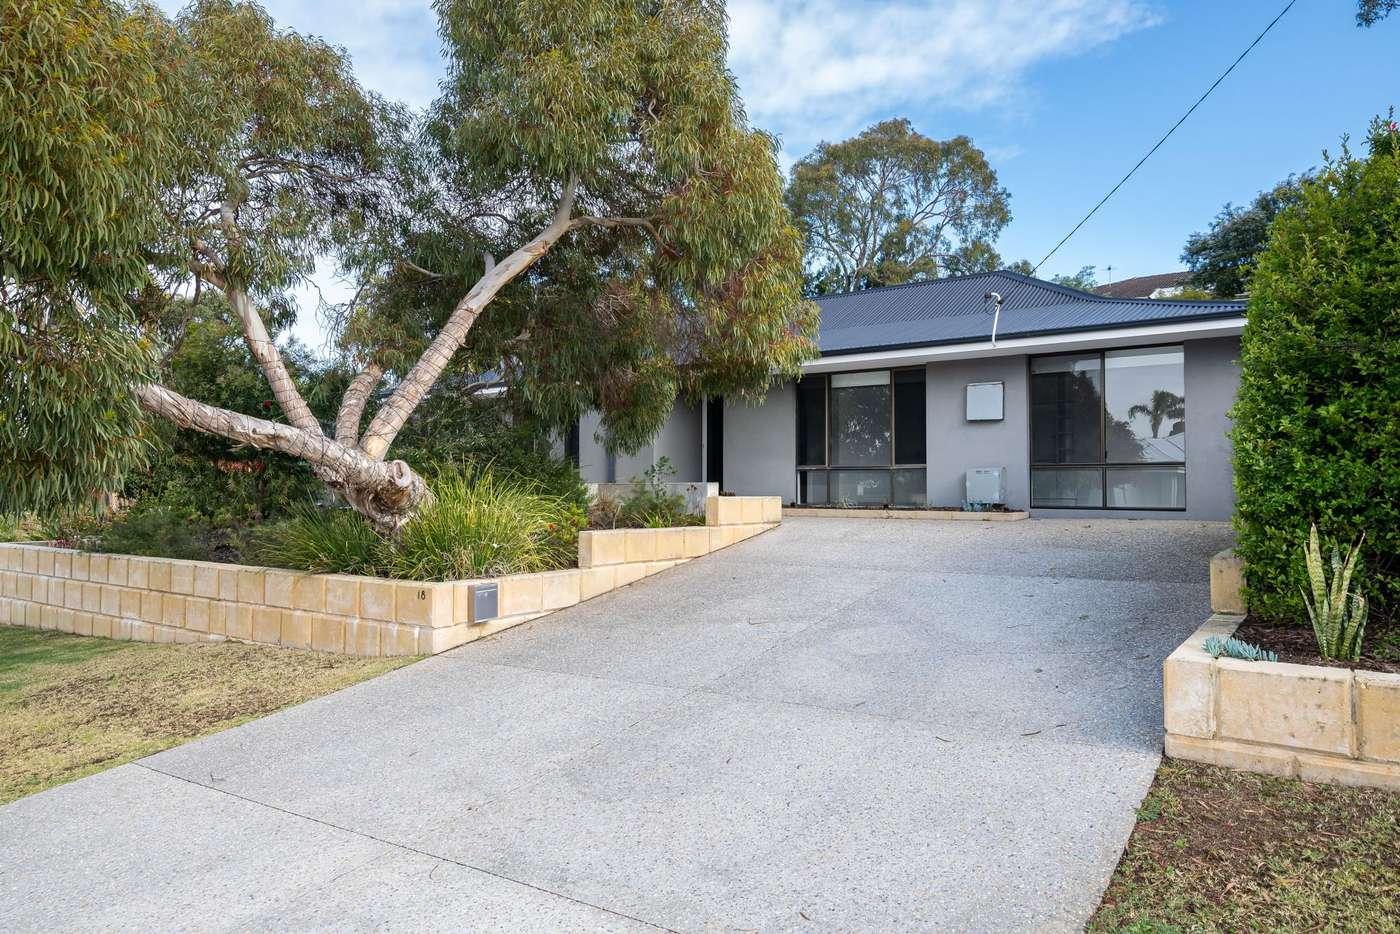 Main view of Homely house listing, 18 Madana Place, Craigie WA 6025